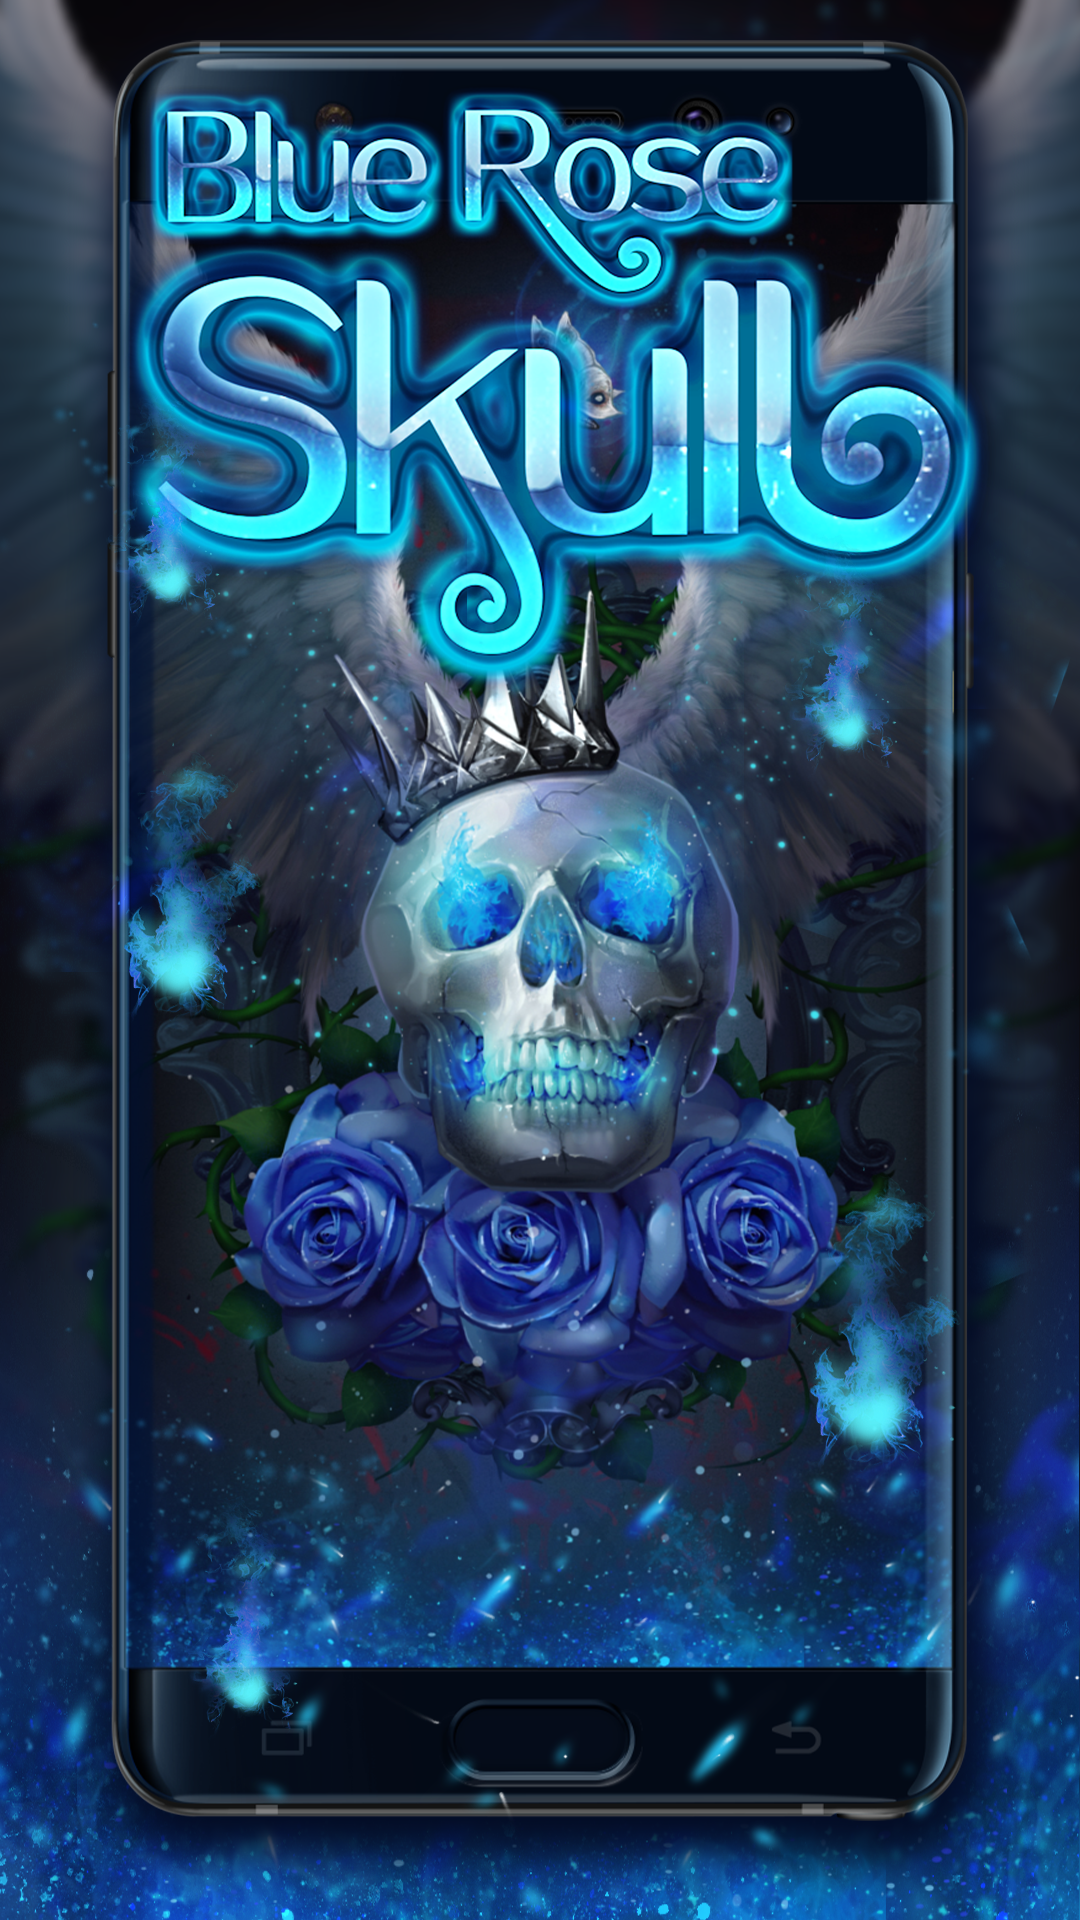 Blue Rose Skull LIVE WALLPAPER (With images) Skull